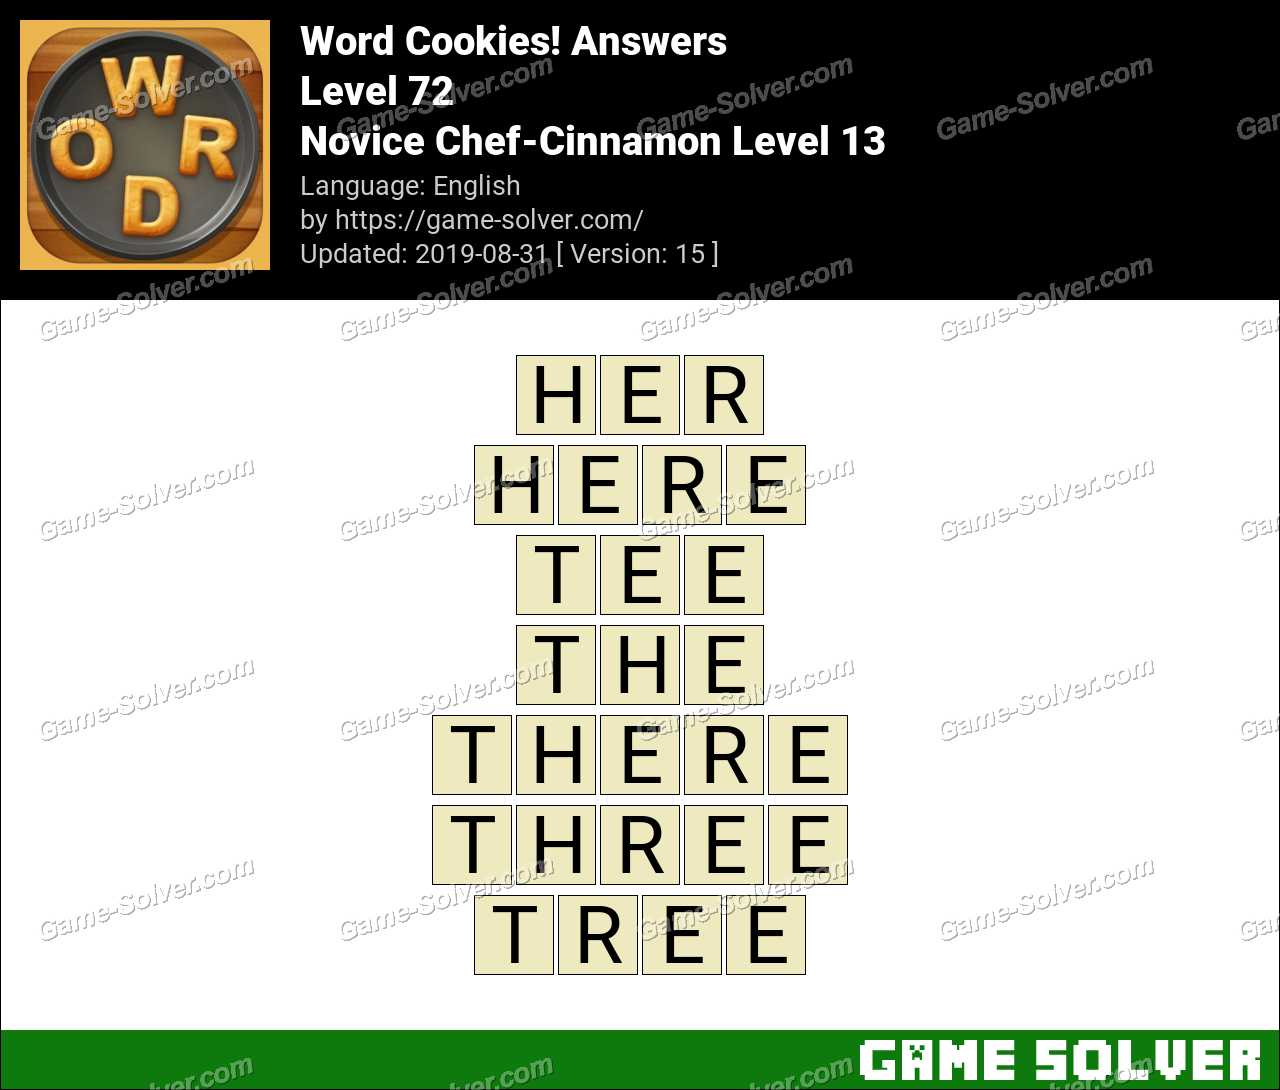 Word Cookies Novice Chef-Cinnamon Level 13 Answers